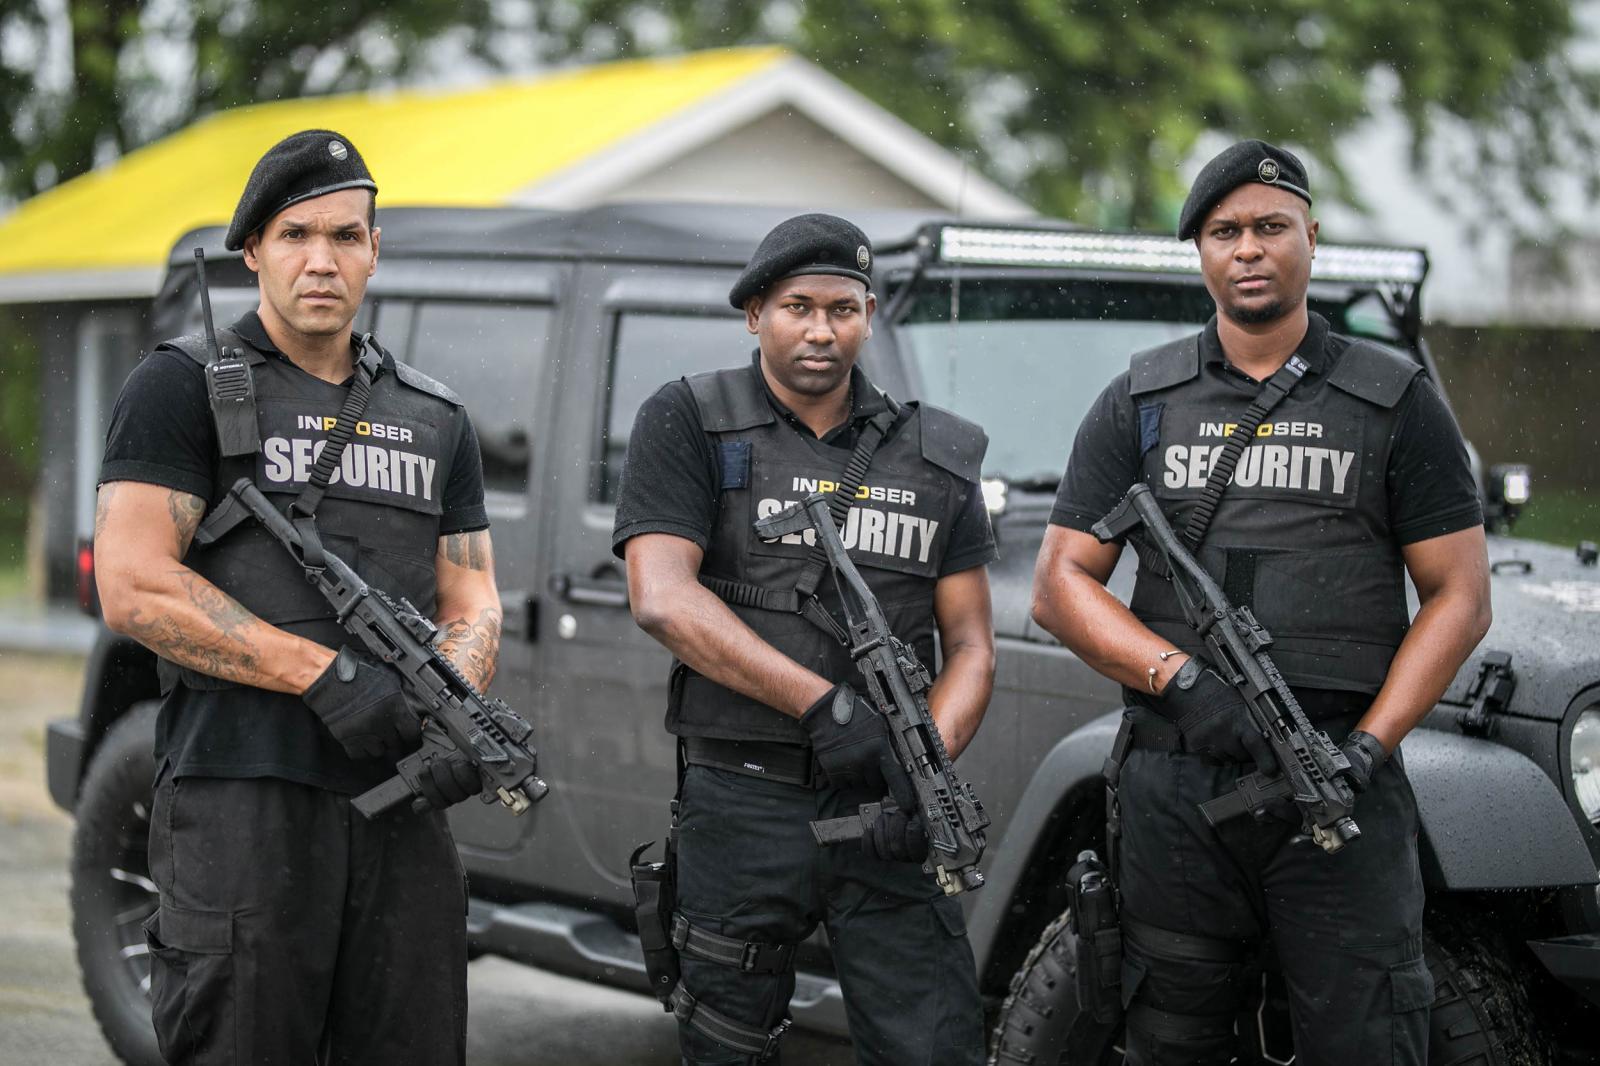 Armed response team